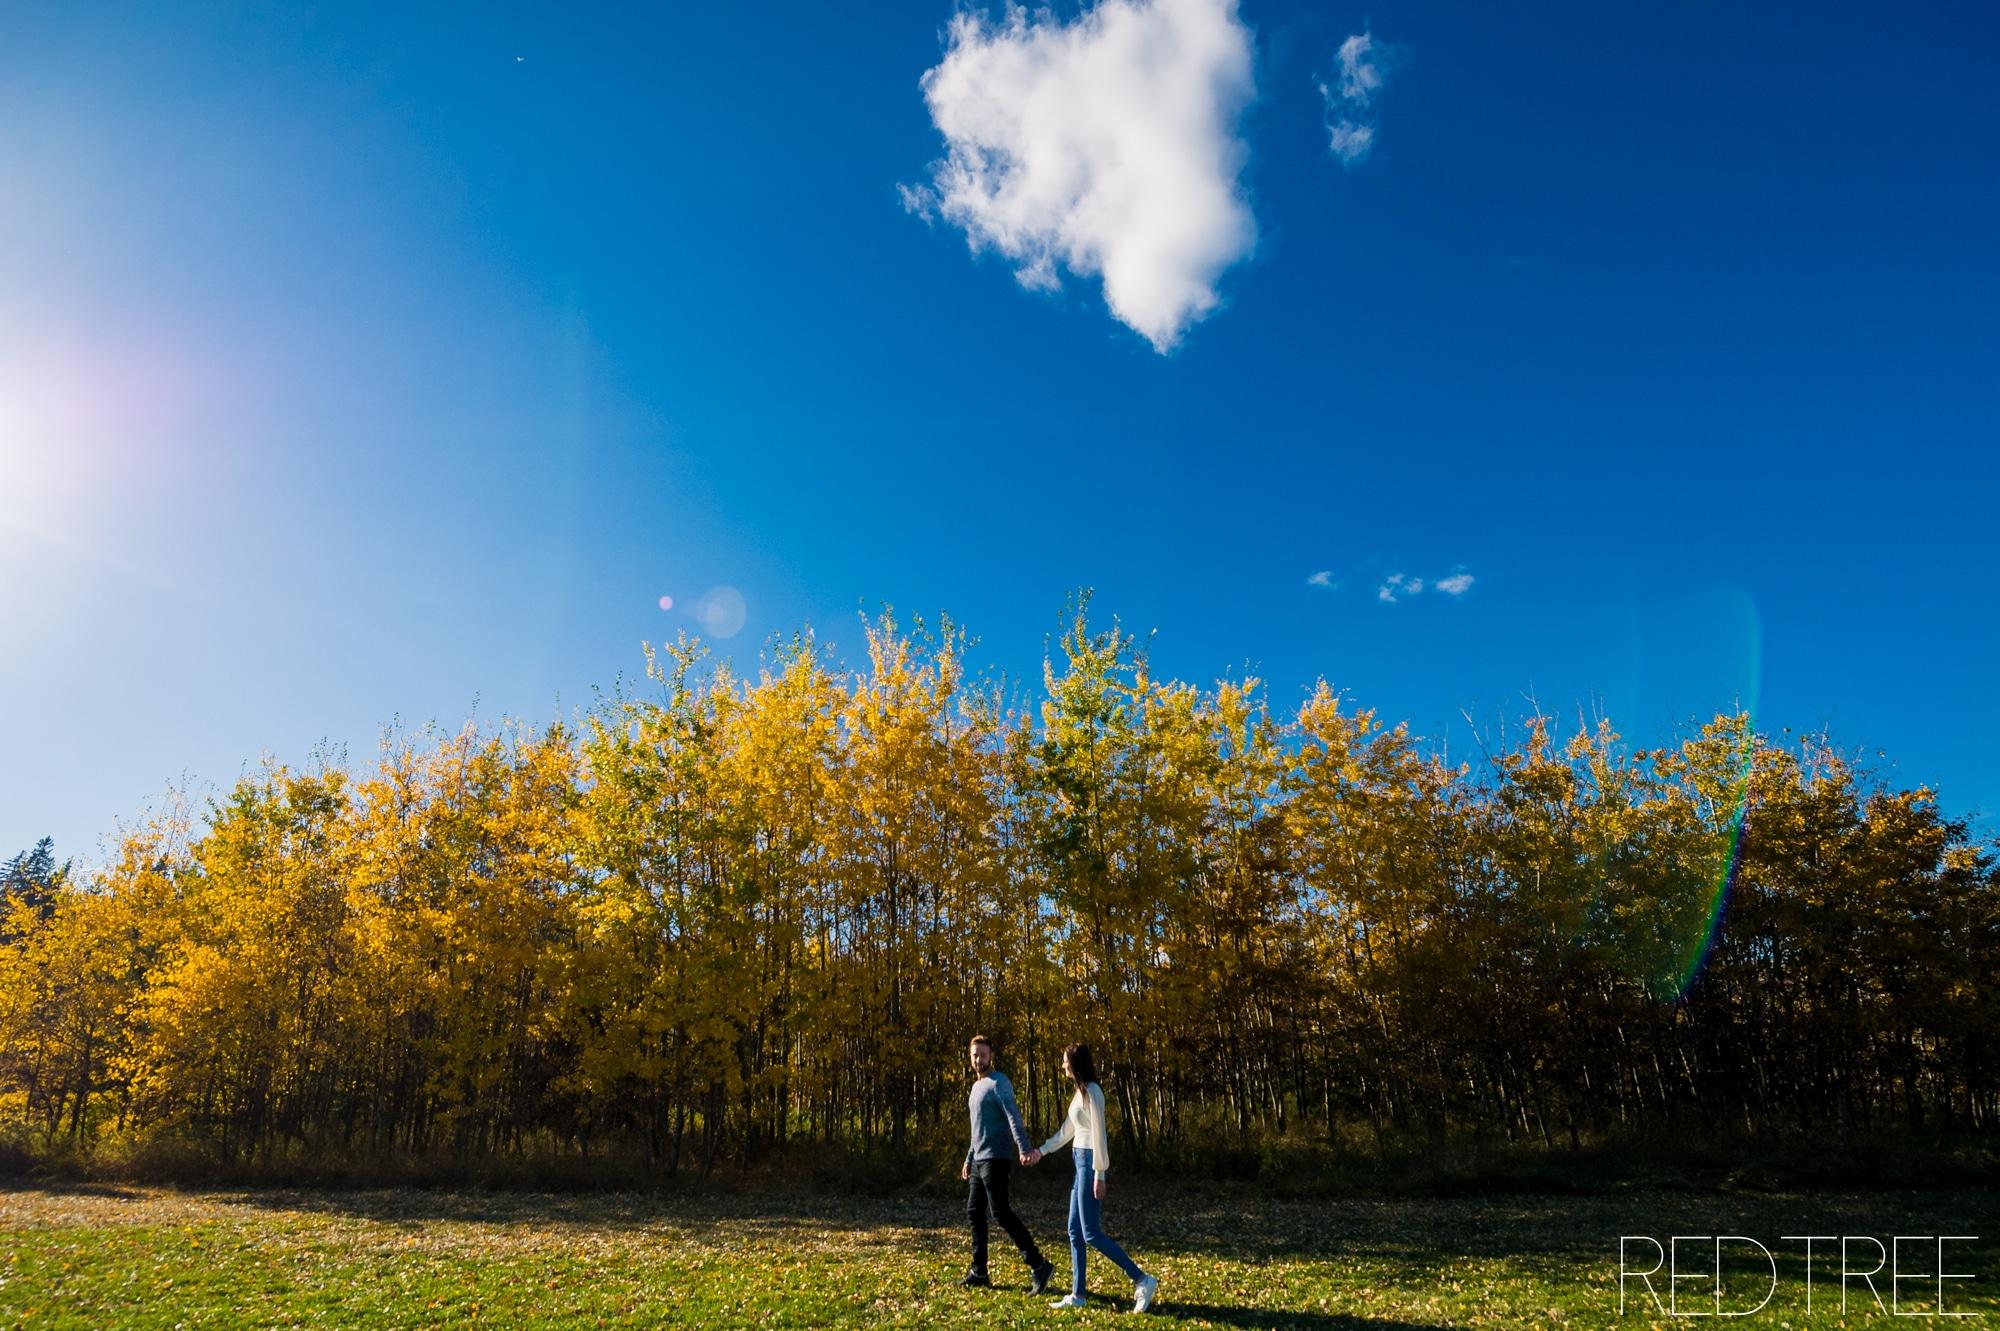 Snow Valley Couple Photography: Edmonton Couple Photographer